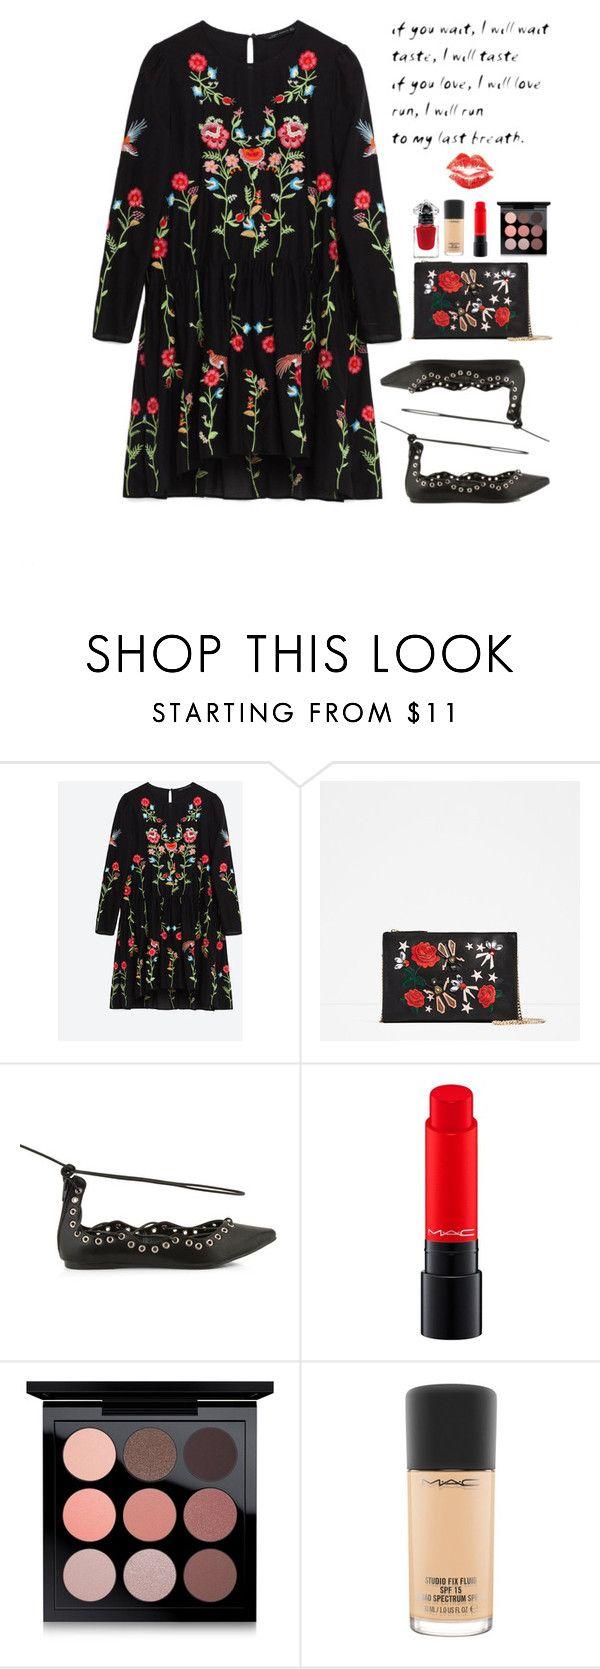 """Zara's little flowered dress"" by mockingjayafire ❤ liked on Polyvore featuring Verali, MAC Cosmetics, La Petite Robe di Chiara Boni, dress, zara, REDLIP, lowcost and mockingjayafire"